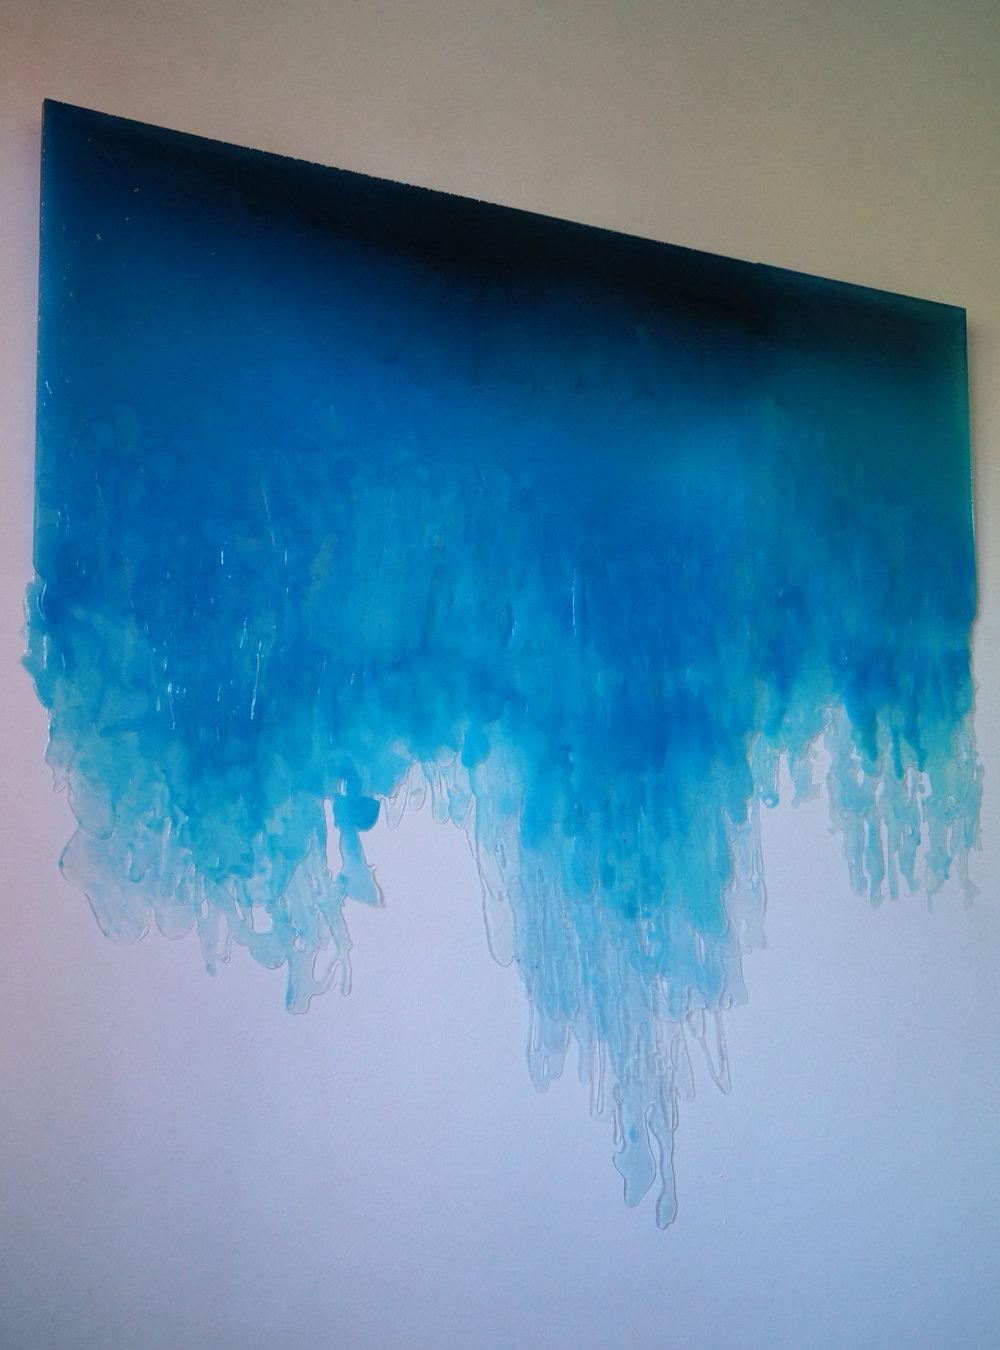 SOLUBLE I ,  2017  Methacrylate, resin and acrylic  125 x 105 cm